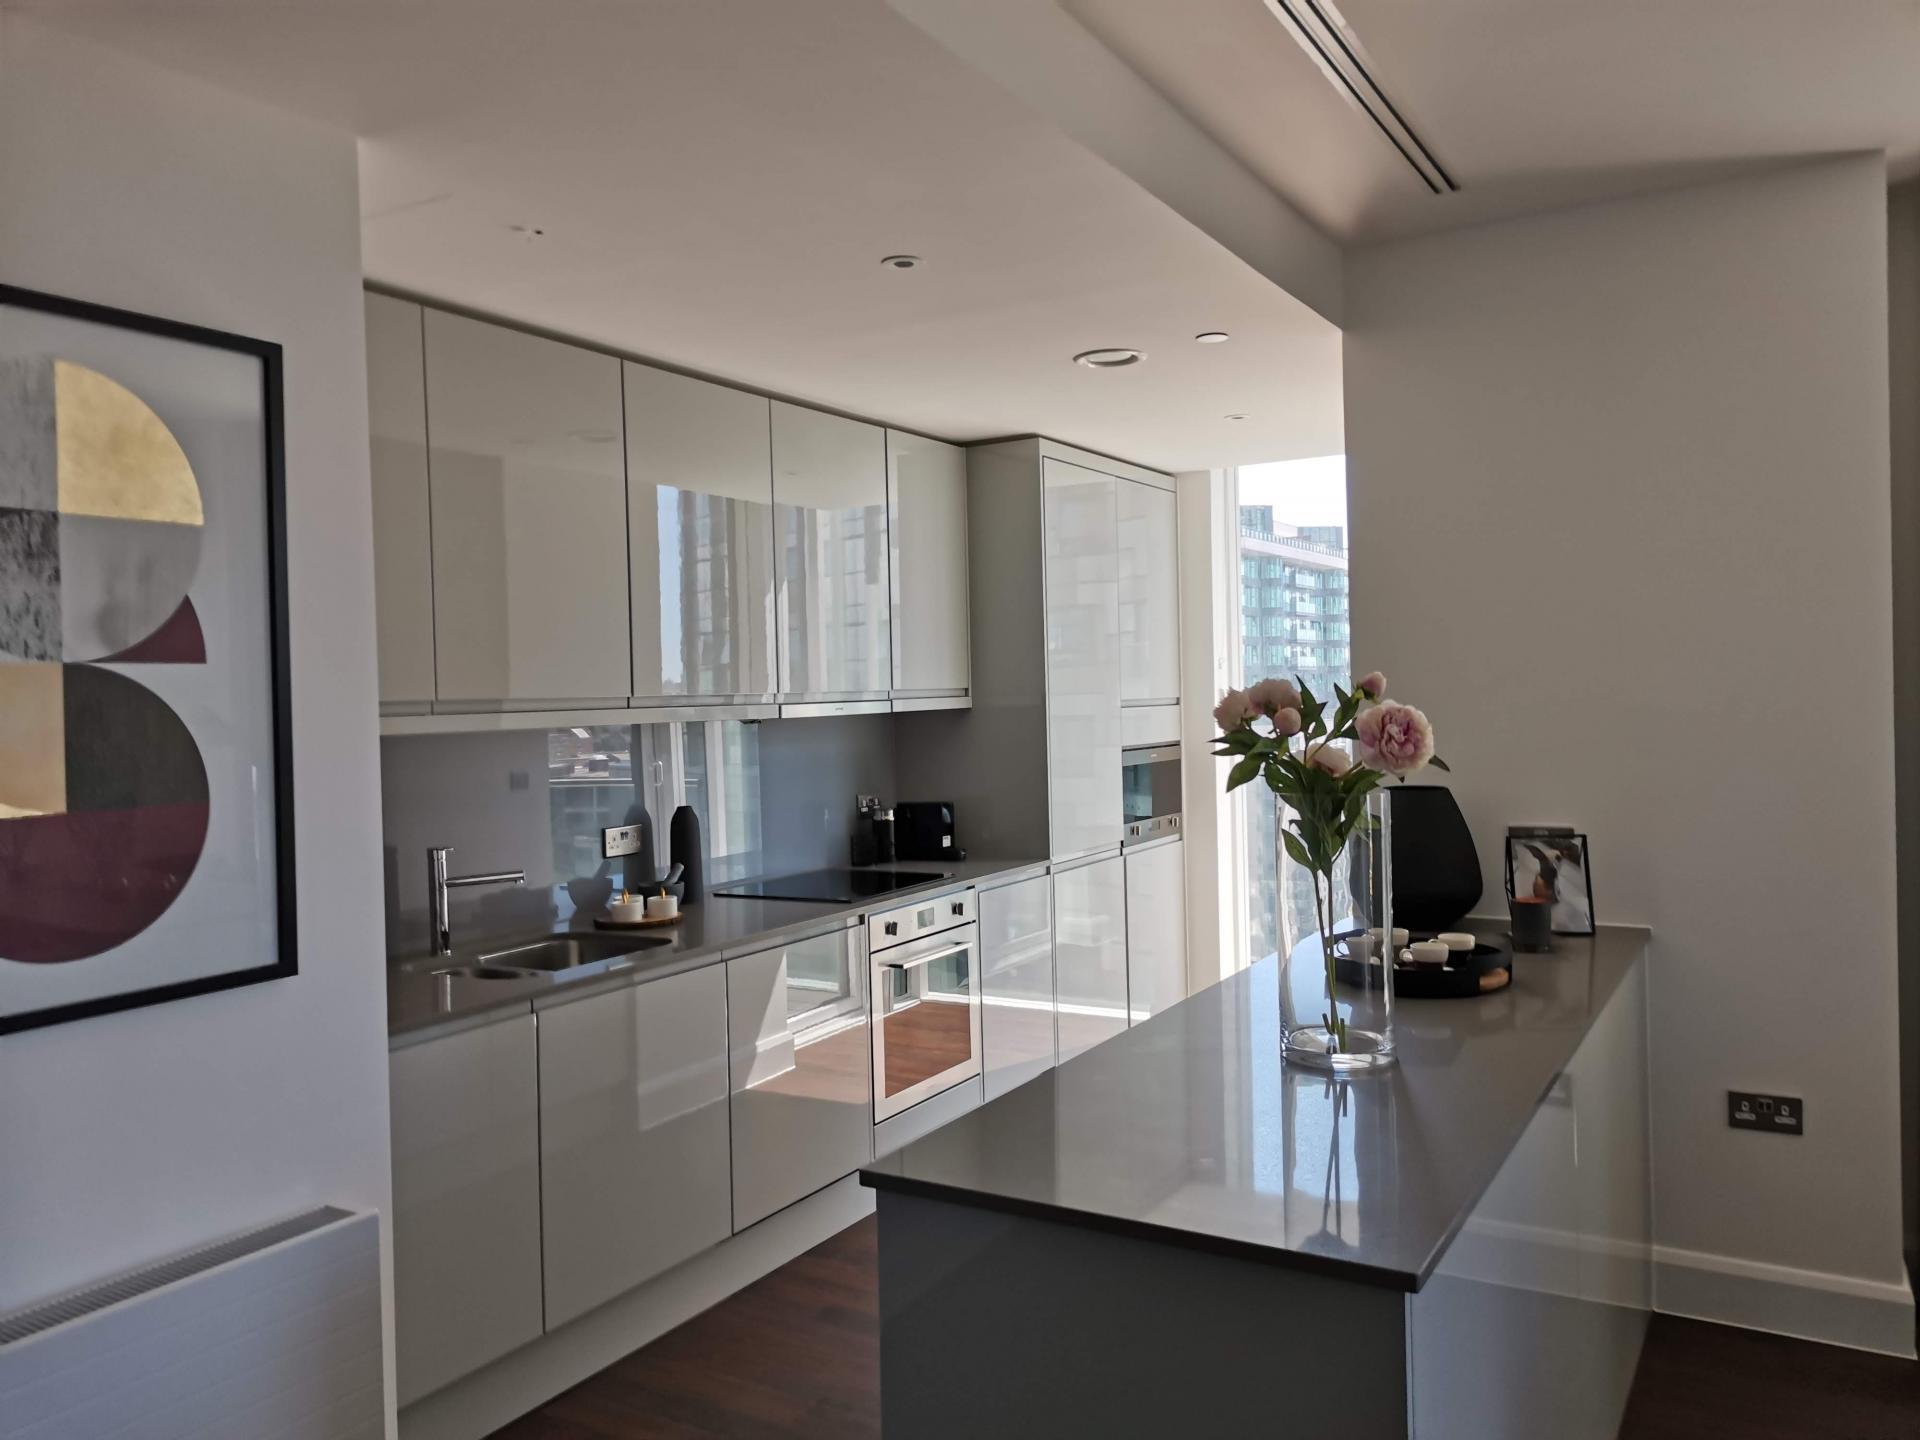 Kitchen at Charles Hope Canary Wharf, Canary Wharf, London - Citybase Apartments